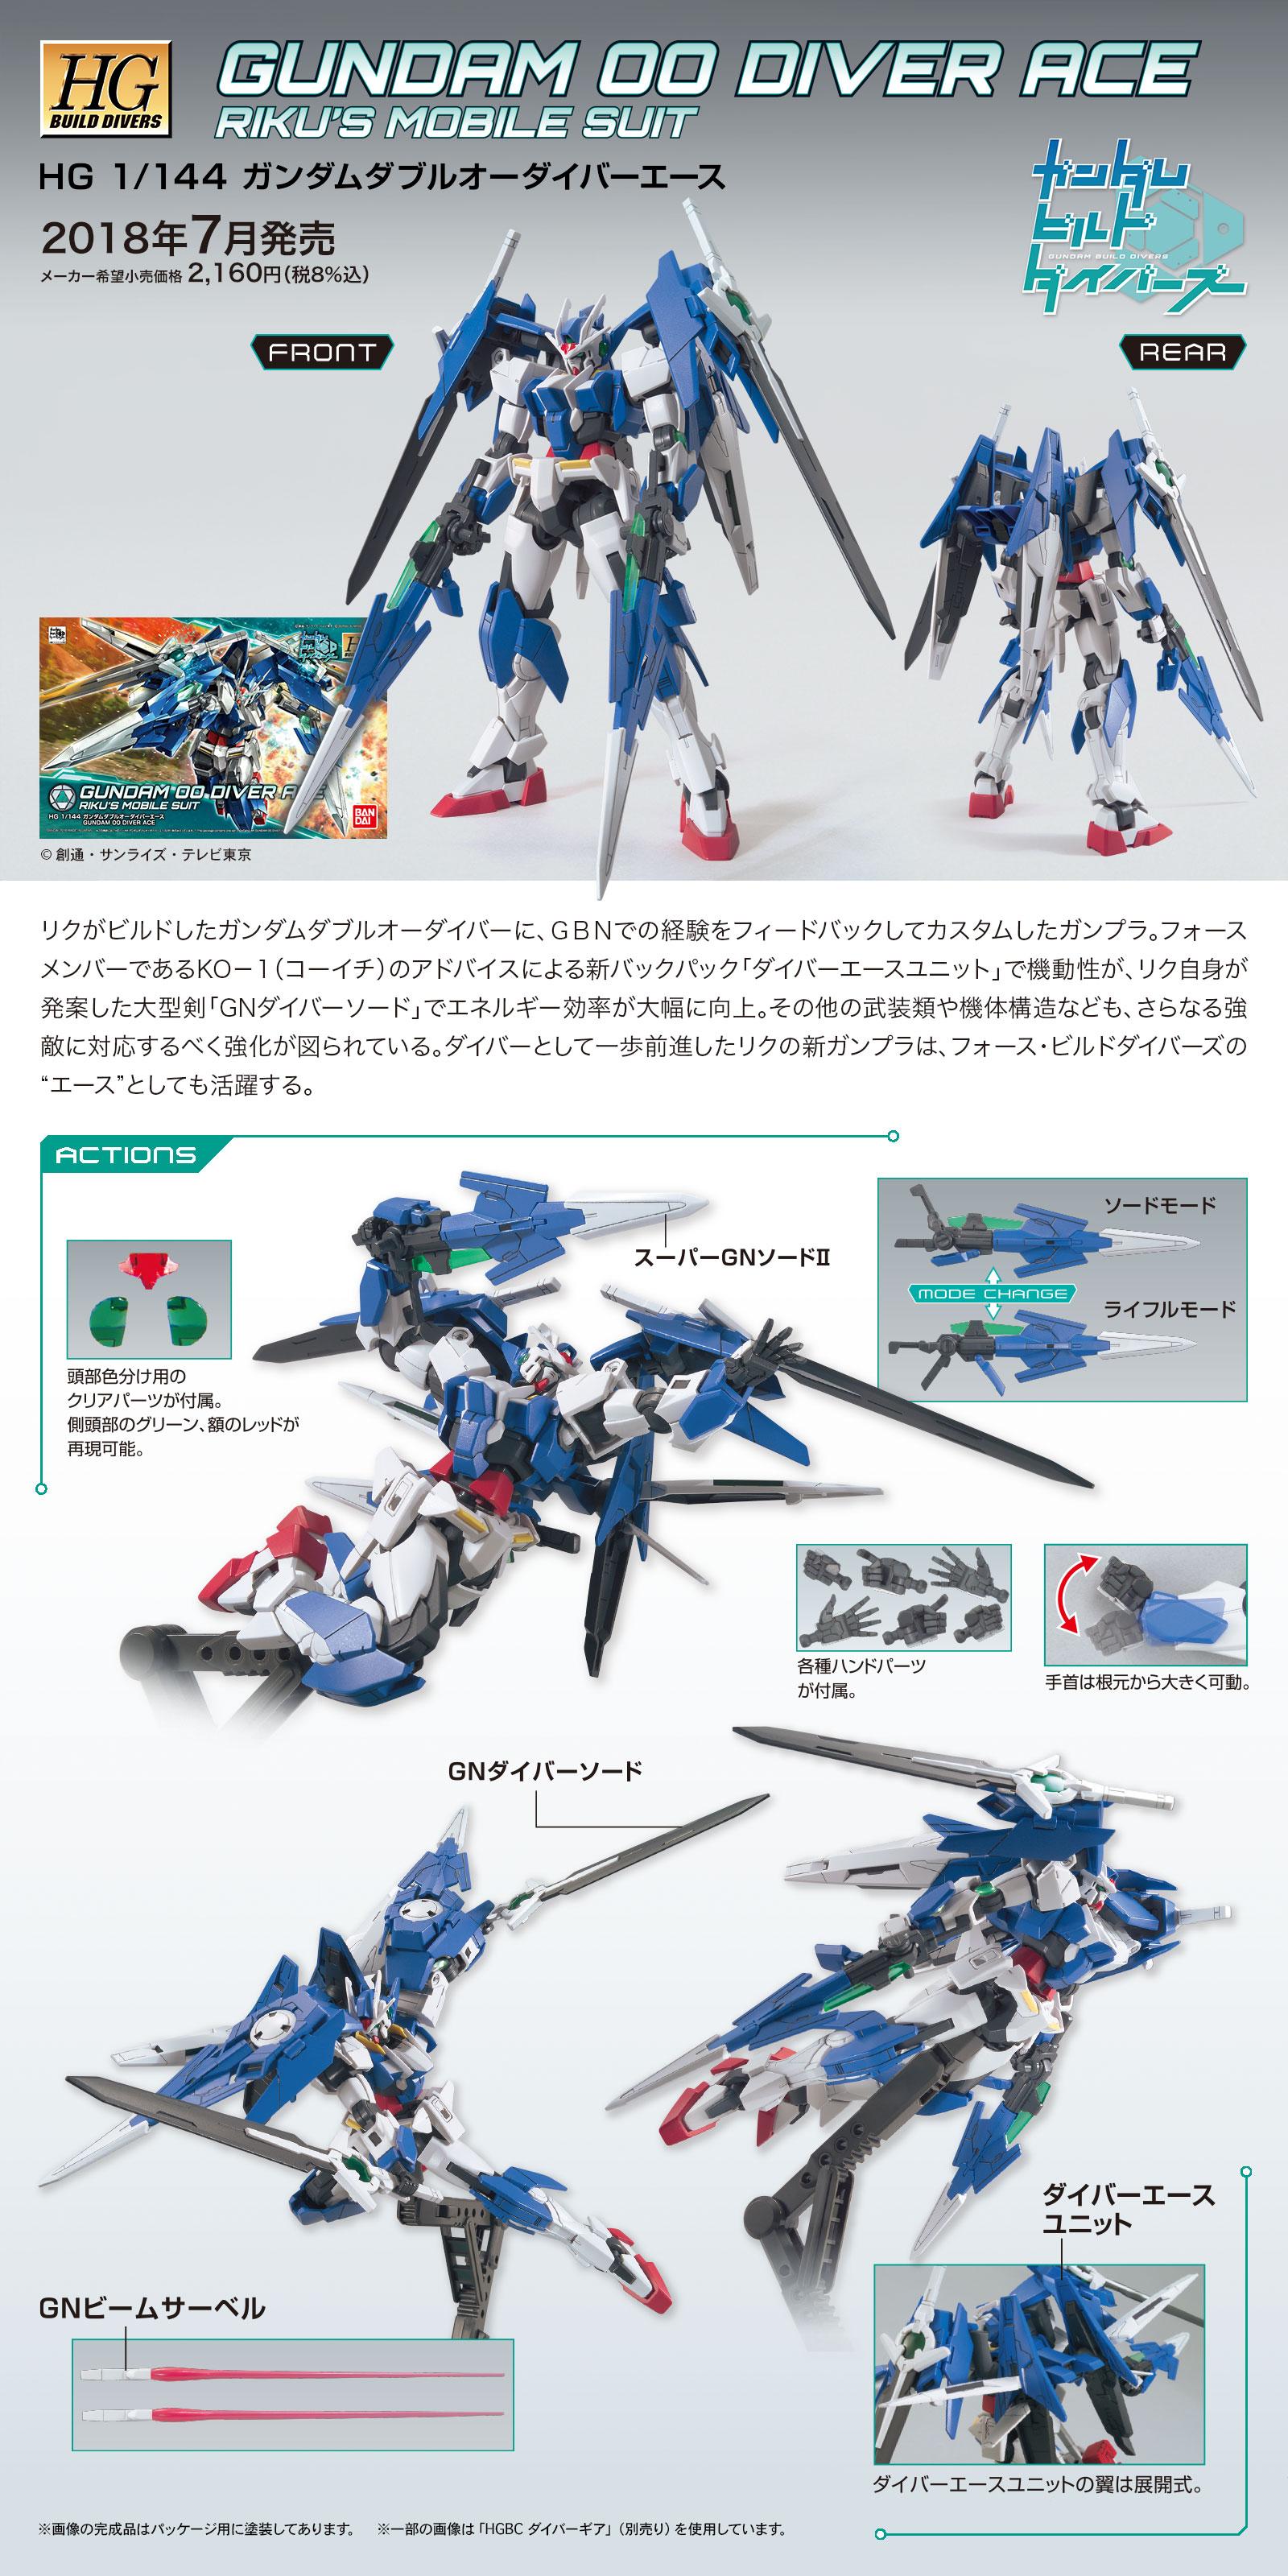 HGBD 1/144 ガンダムダブルオーダイバーエース [Gundam 00 Diver ACE] JAN:4549660257561 公式商品説明(画像)